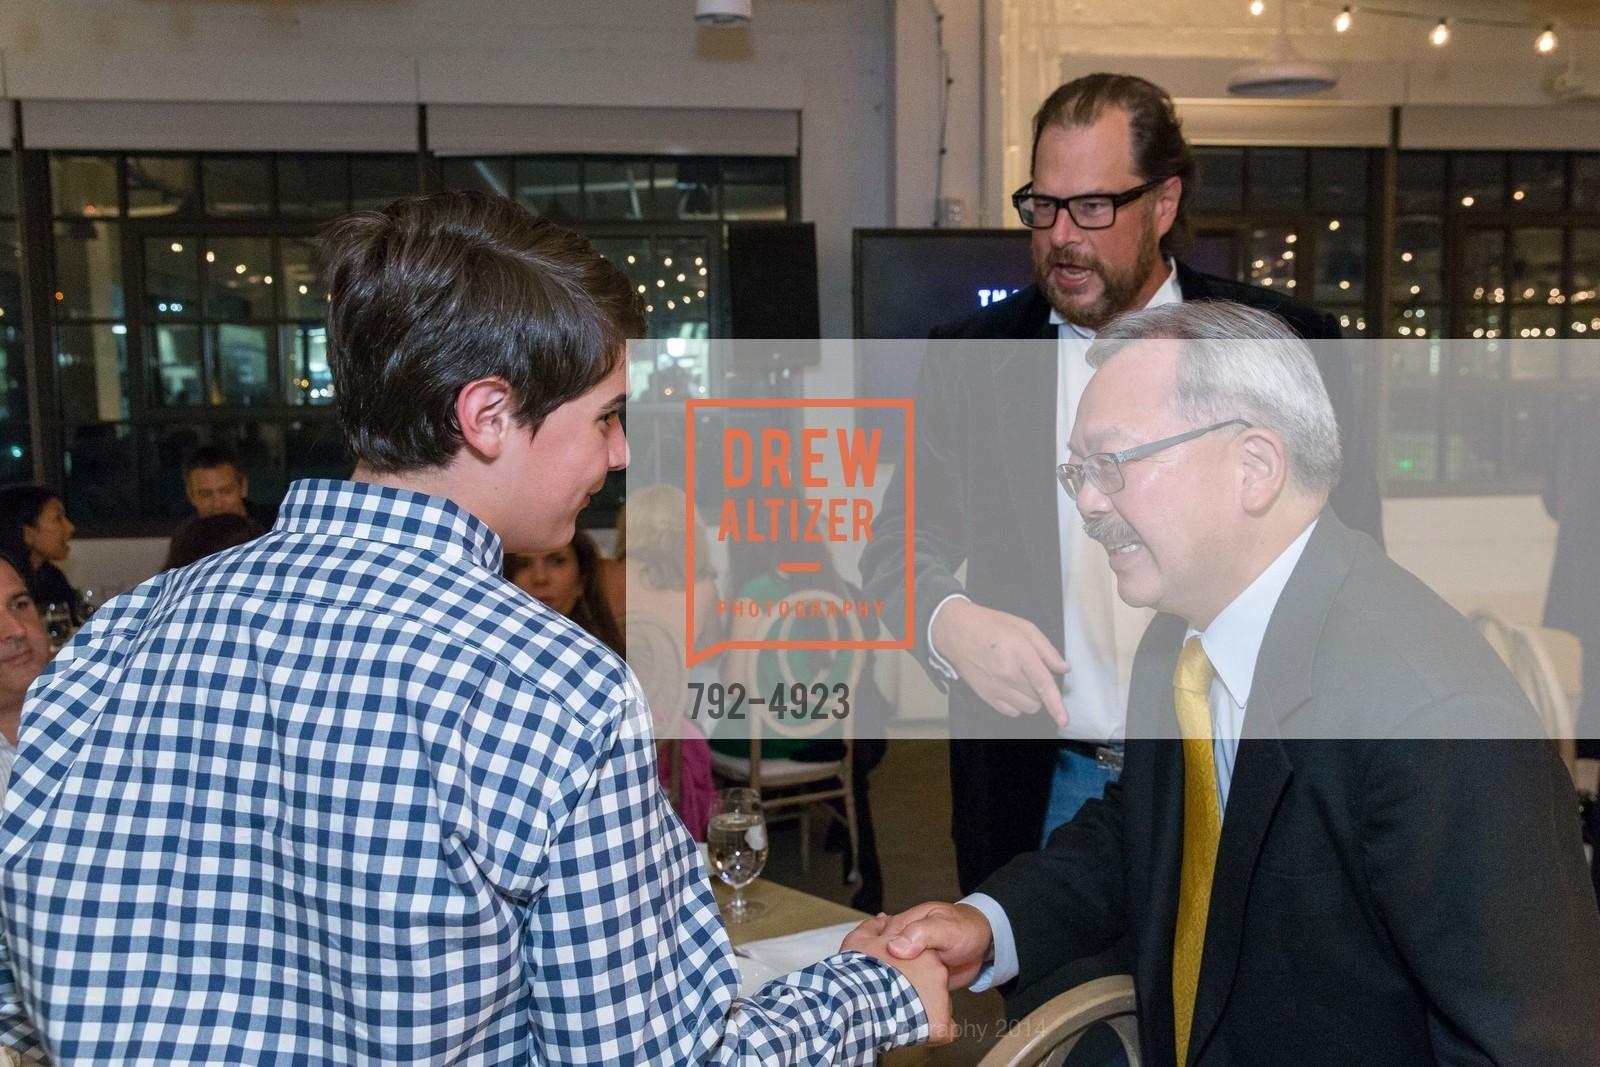 Marc Benioff, Mayor Ed Lee, Photo #792-4923